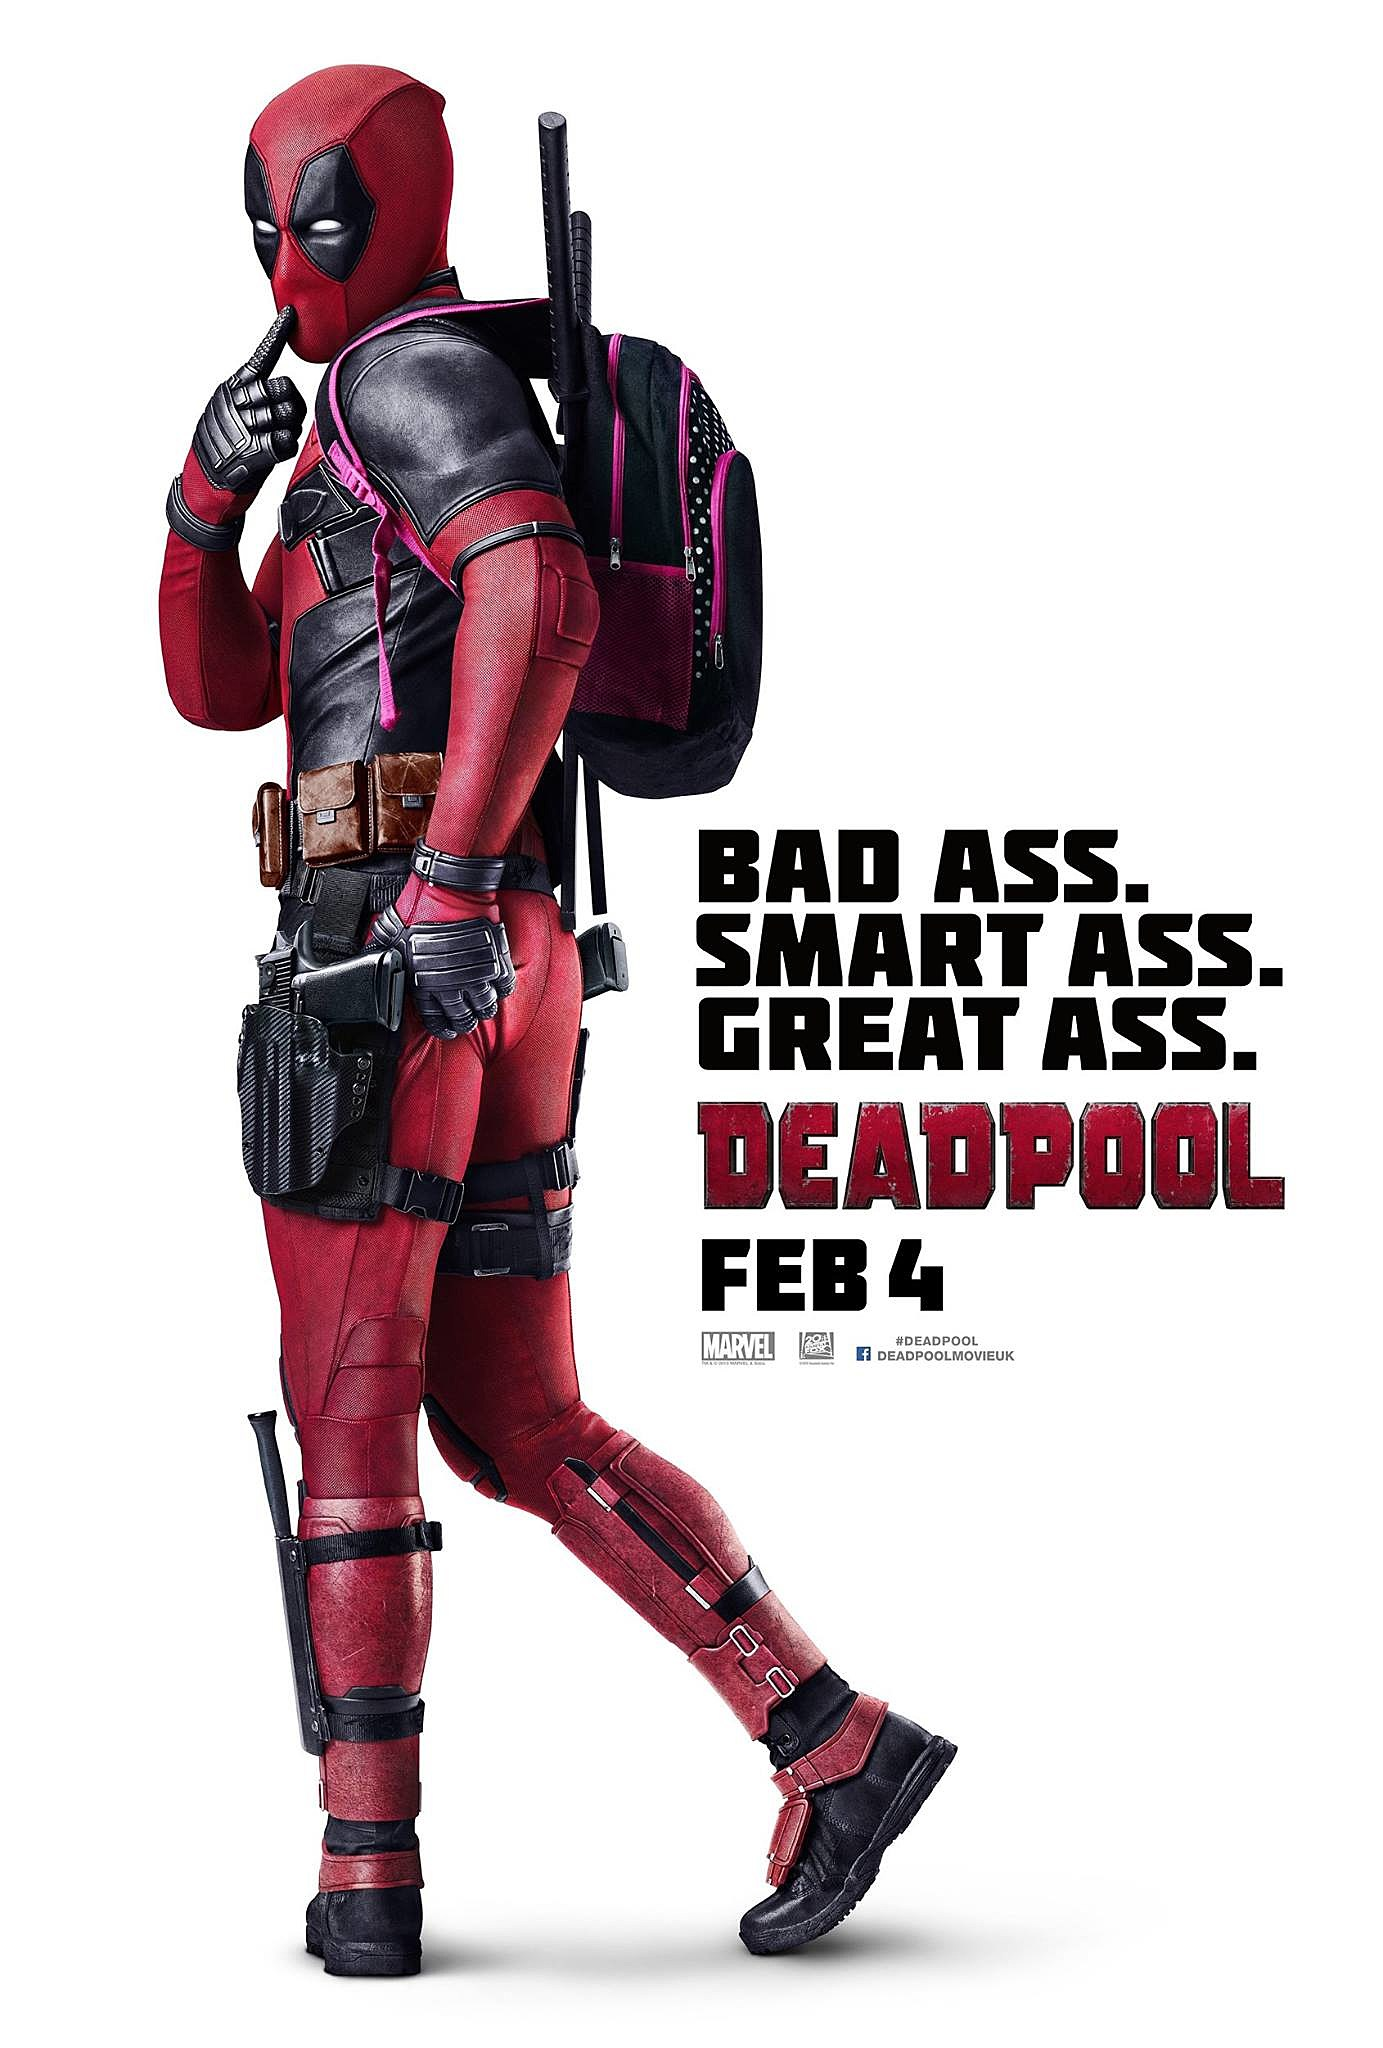 New 'Deadpool' Poster Has a Cheeky Sense of Humor